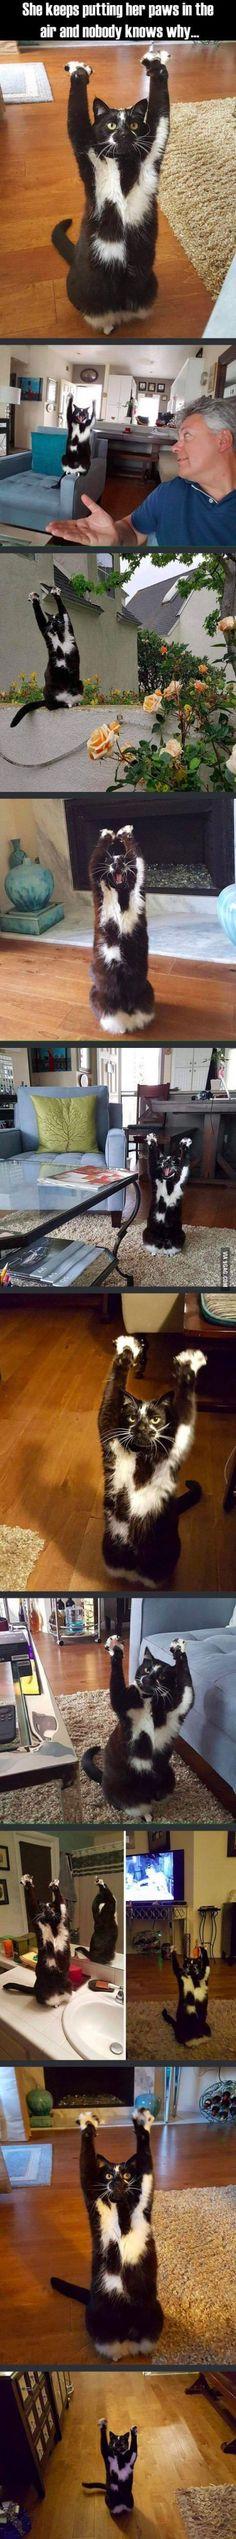 Absolutely adorable!!!! ❤️❤️❤️❤️ kitties!!!!! #catsfunnylaughingsohard